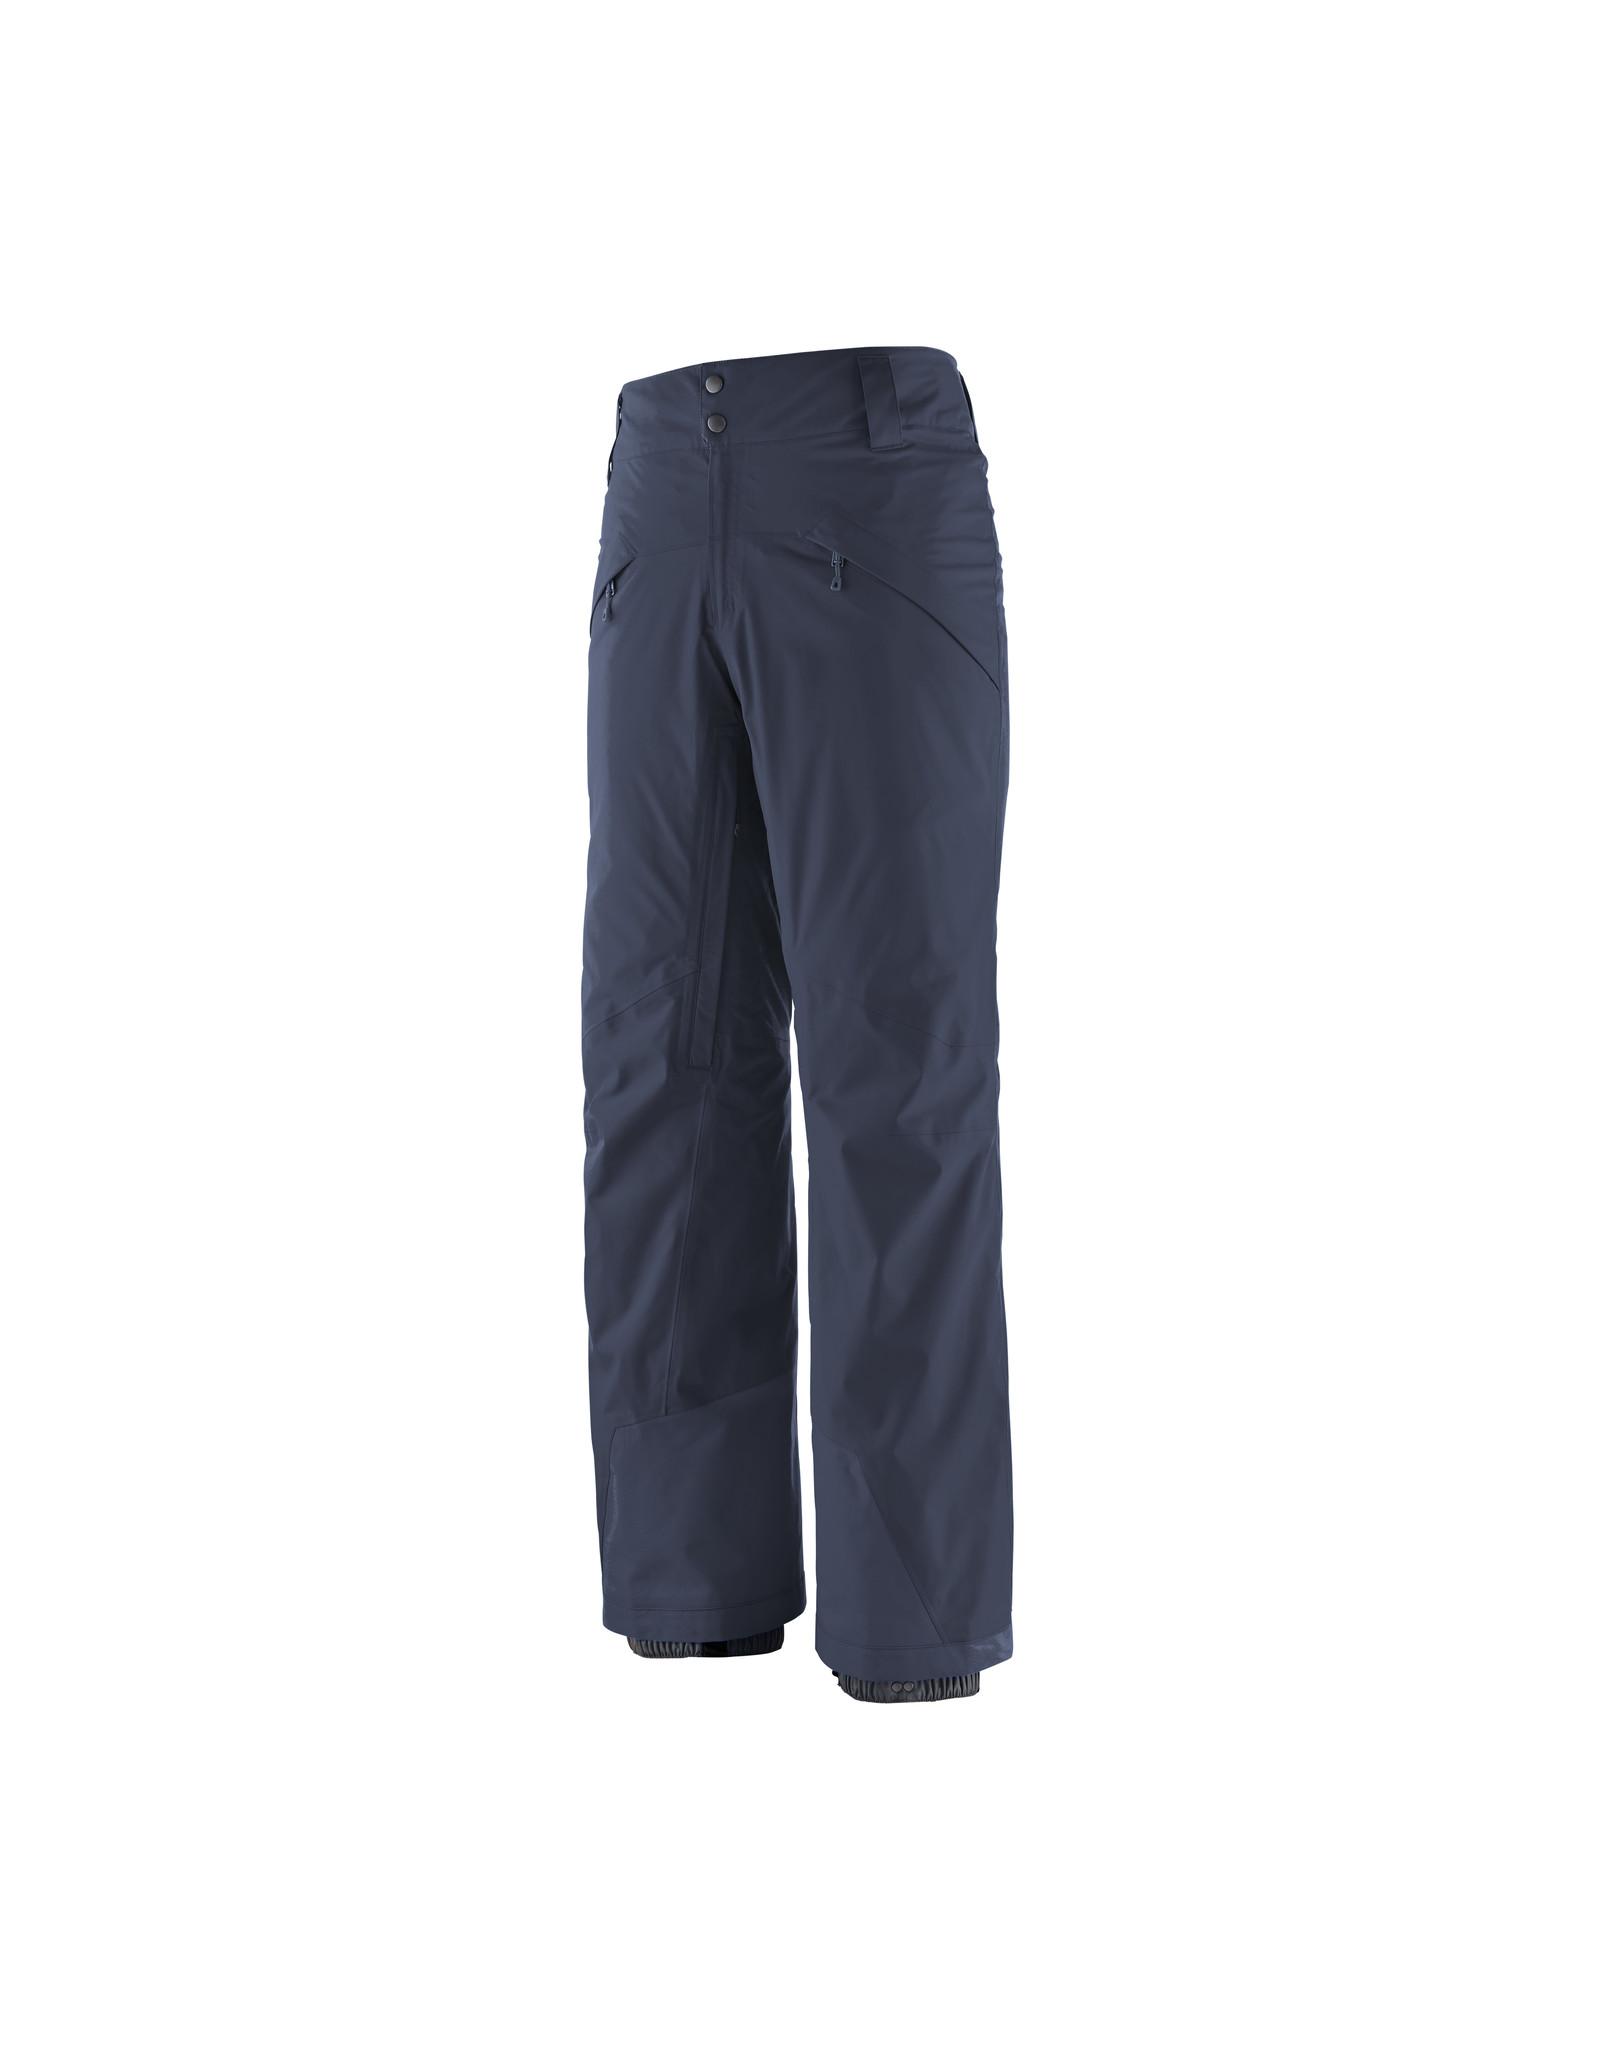 Patagonia M's Snowshot Pants